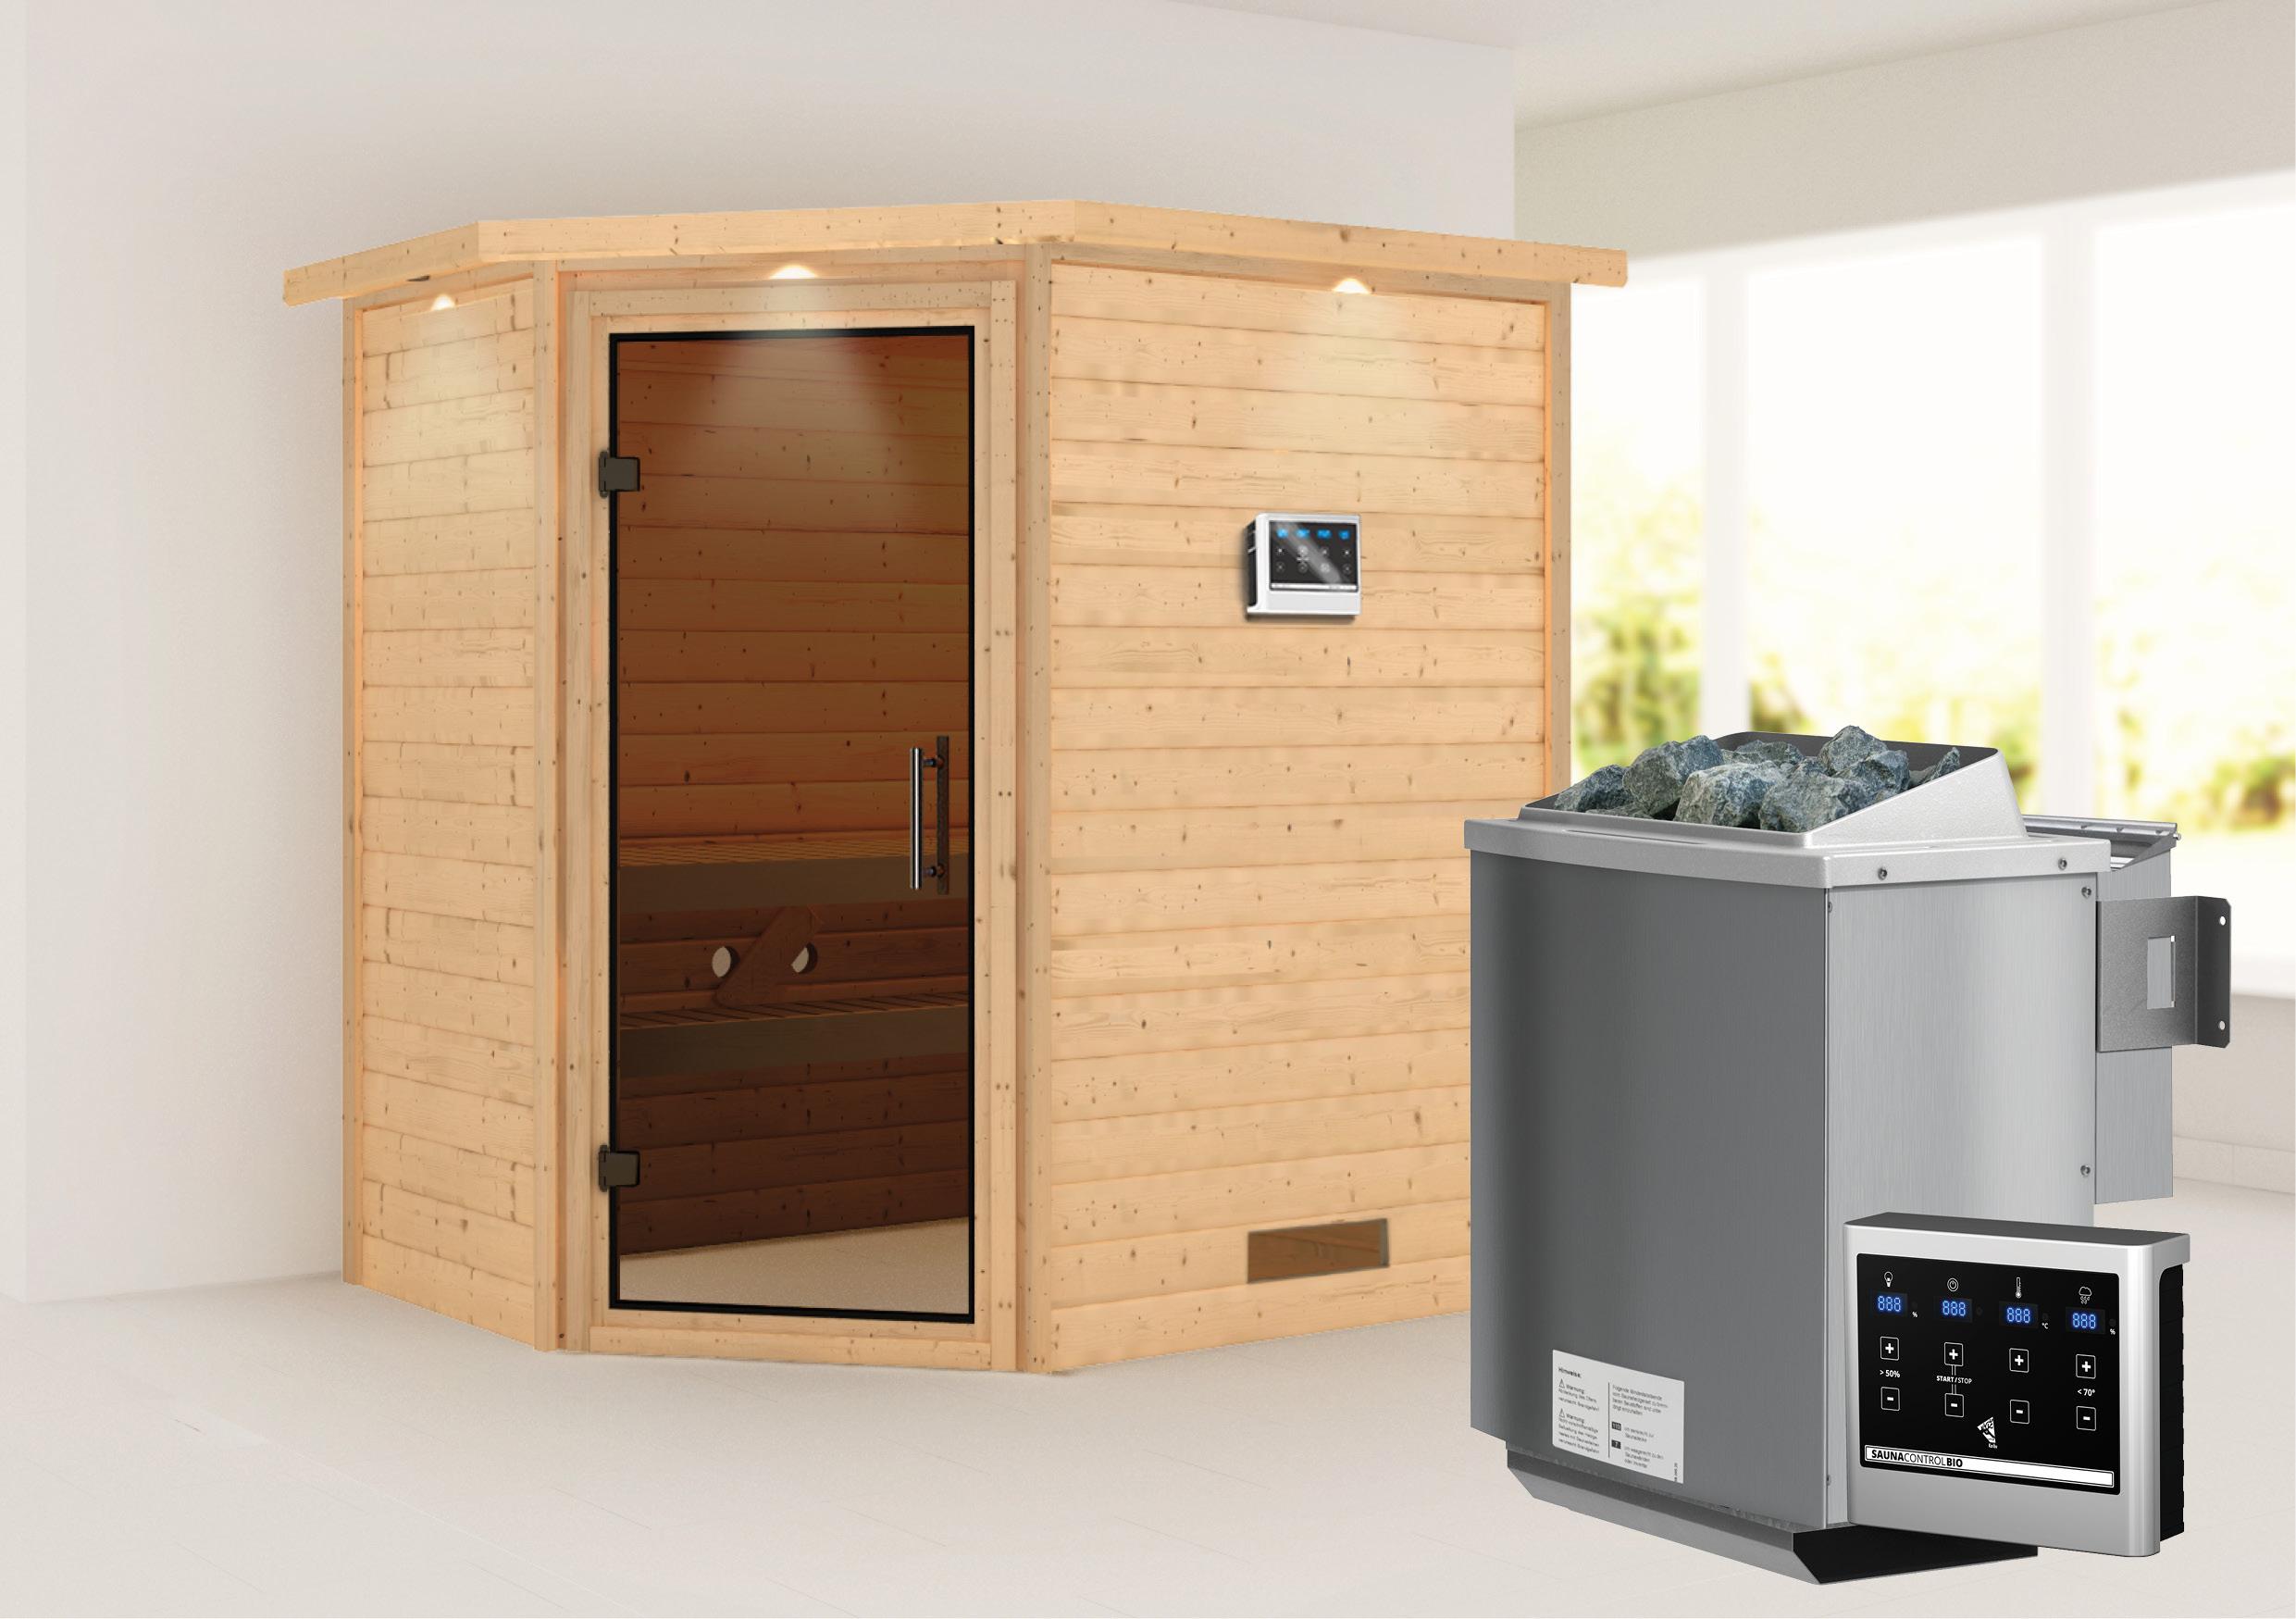 WoodFeeling Sauna Svea 38mm BioSaunaofen 9kW ext. Kranz moderne Tür Bild 2